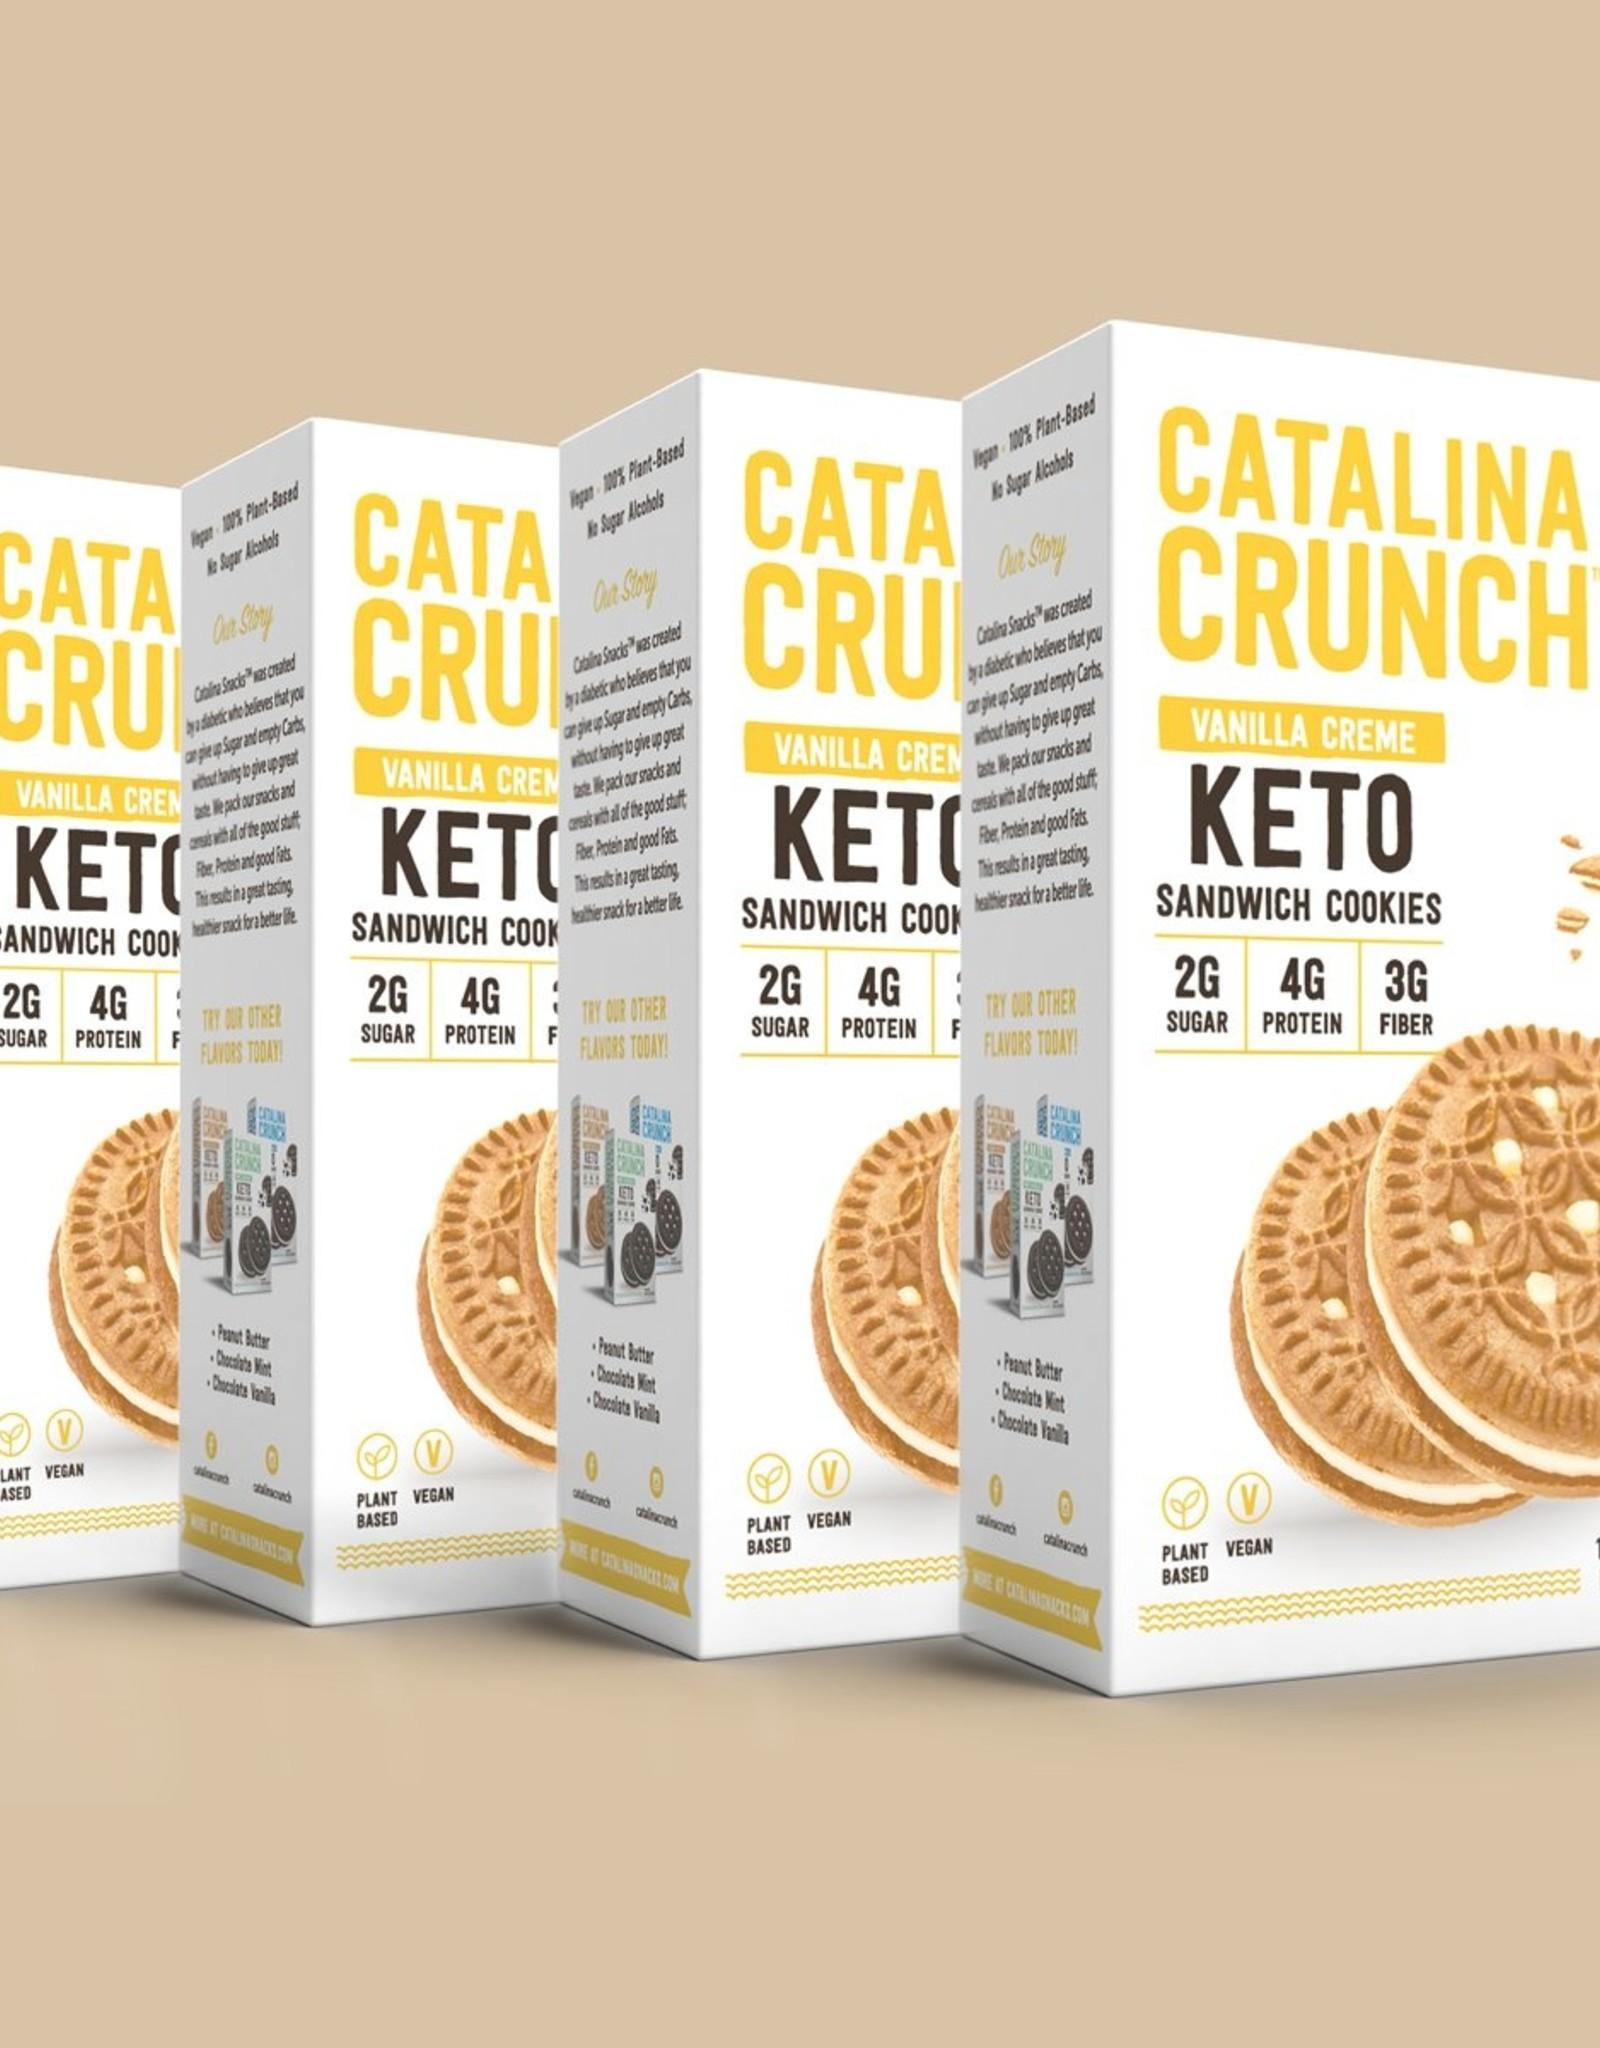 Catalina Crunch Catalina Crunch - Sandwich Cookies,  Vanilla Creme (193g)